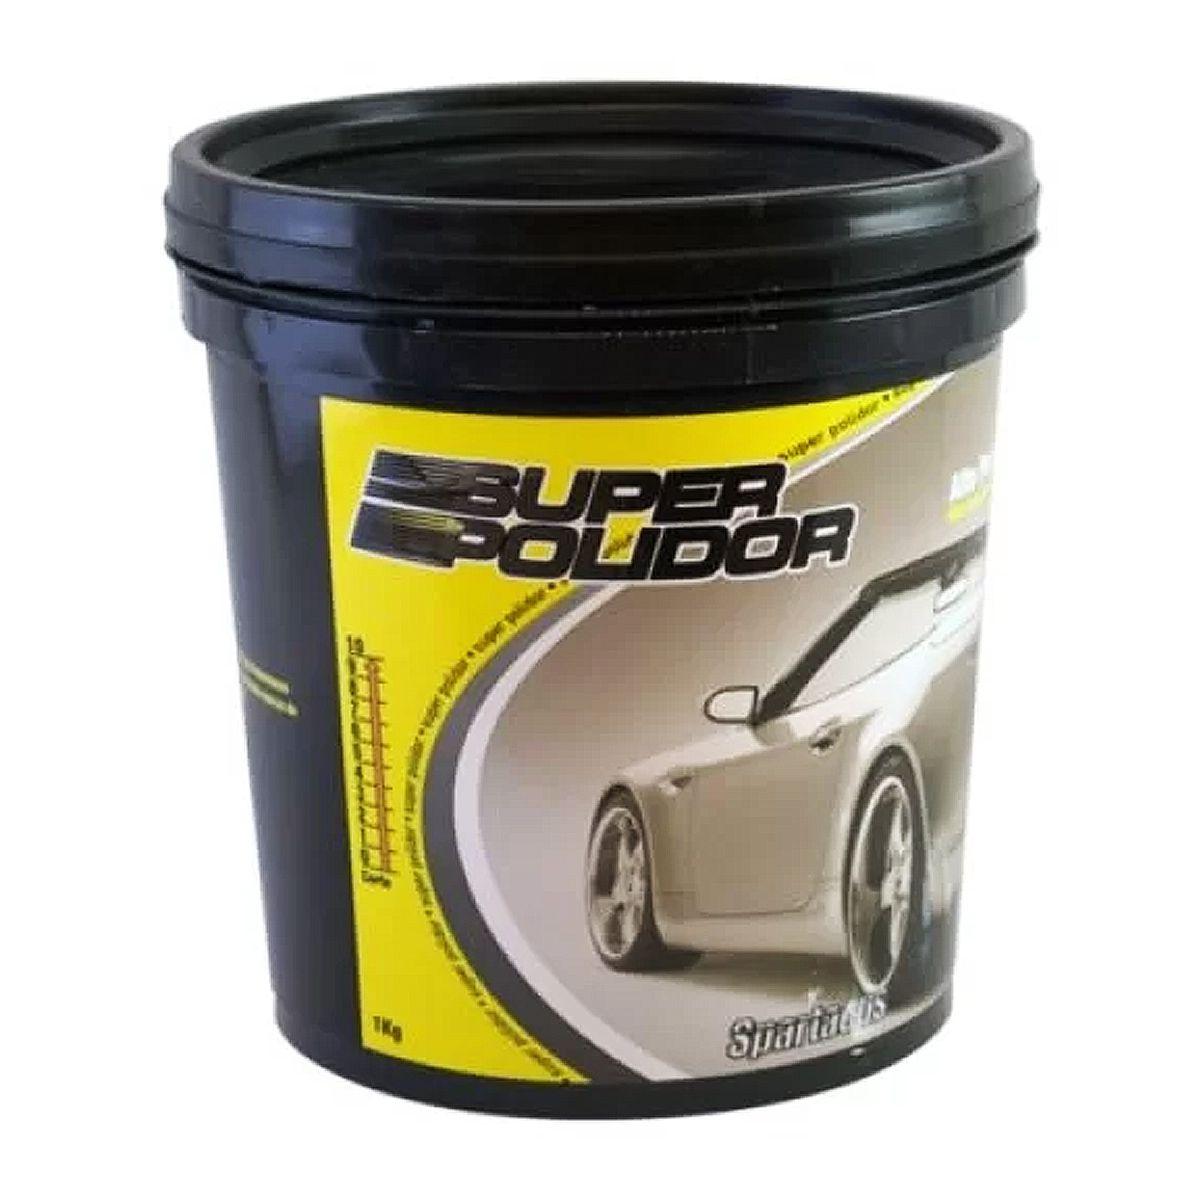 Super Polidor Spartacus Autoamerica 1Kg